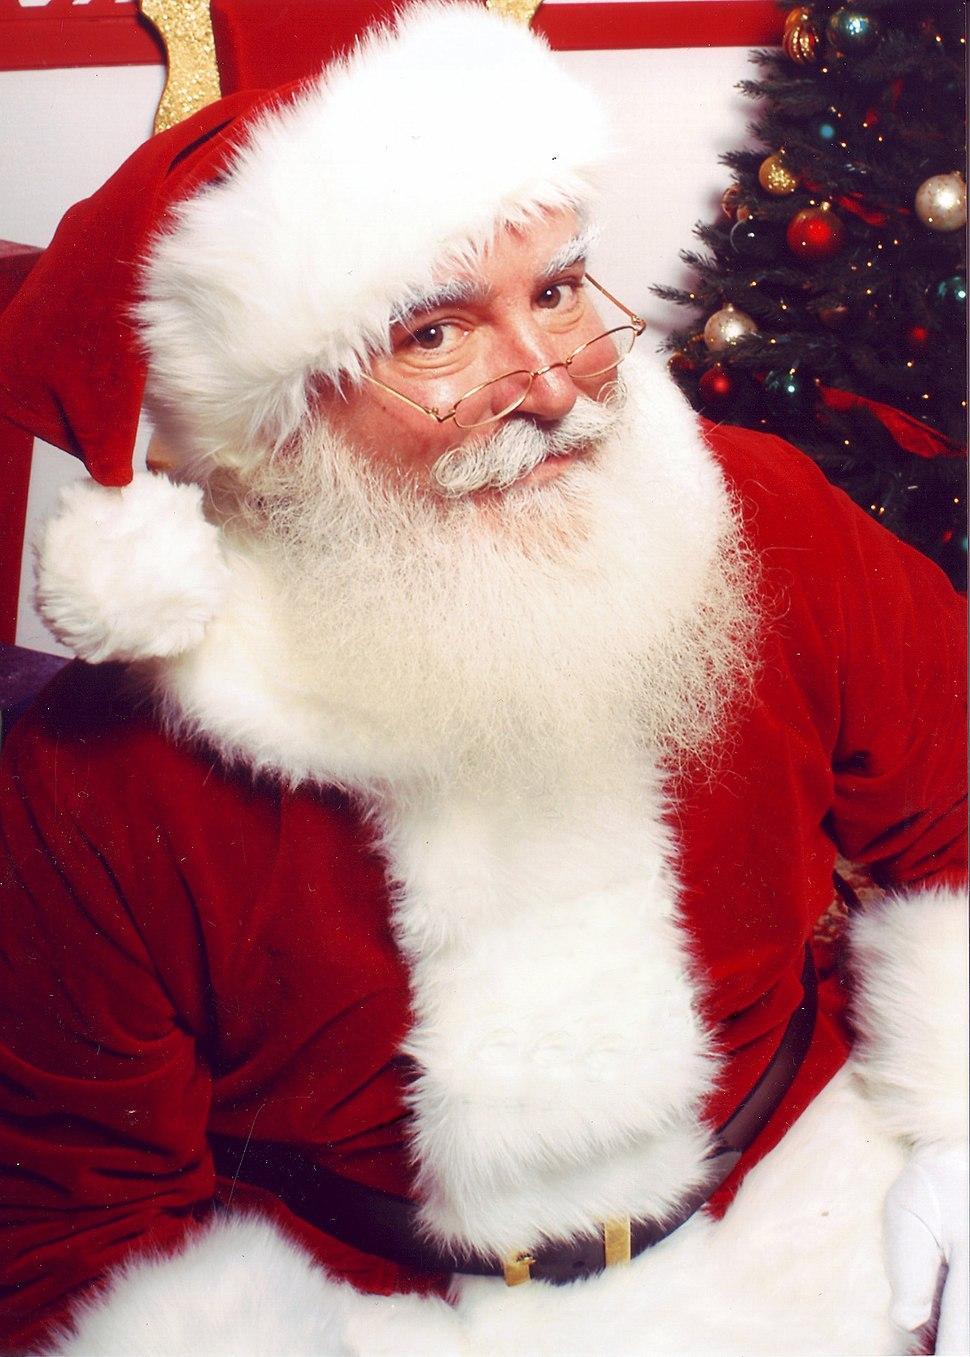 Jonathan G Meath portrays Santa Claus